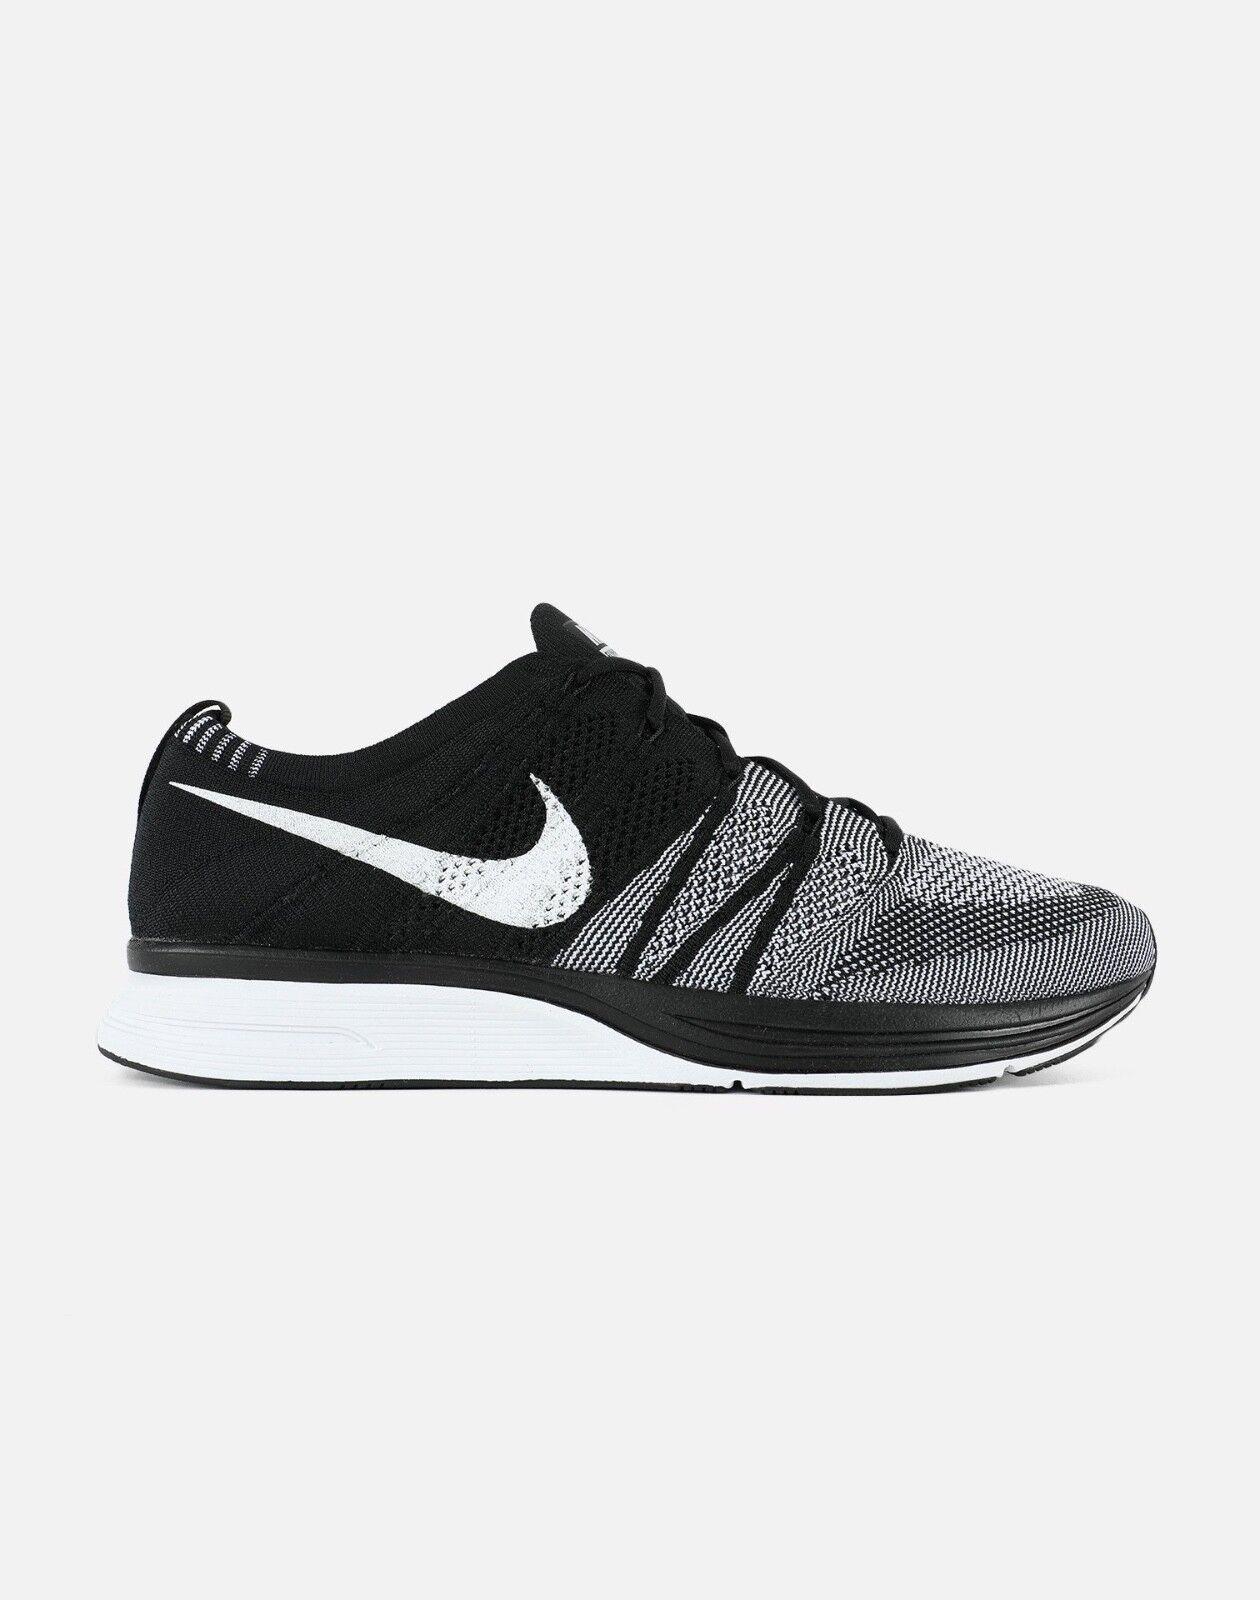 2018 Nike Flyknit Trainer Black White Oreo AH8396-005 size 8-13